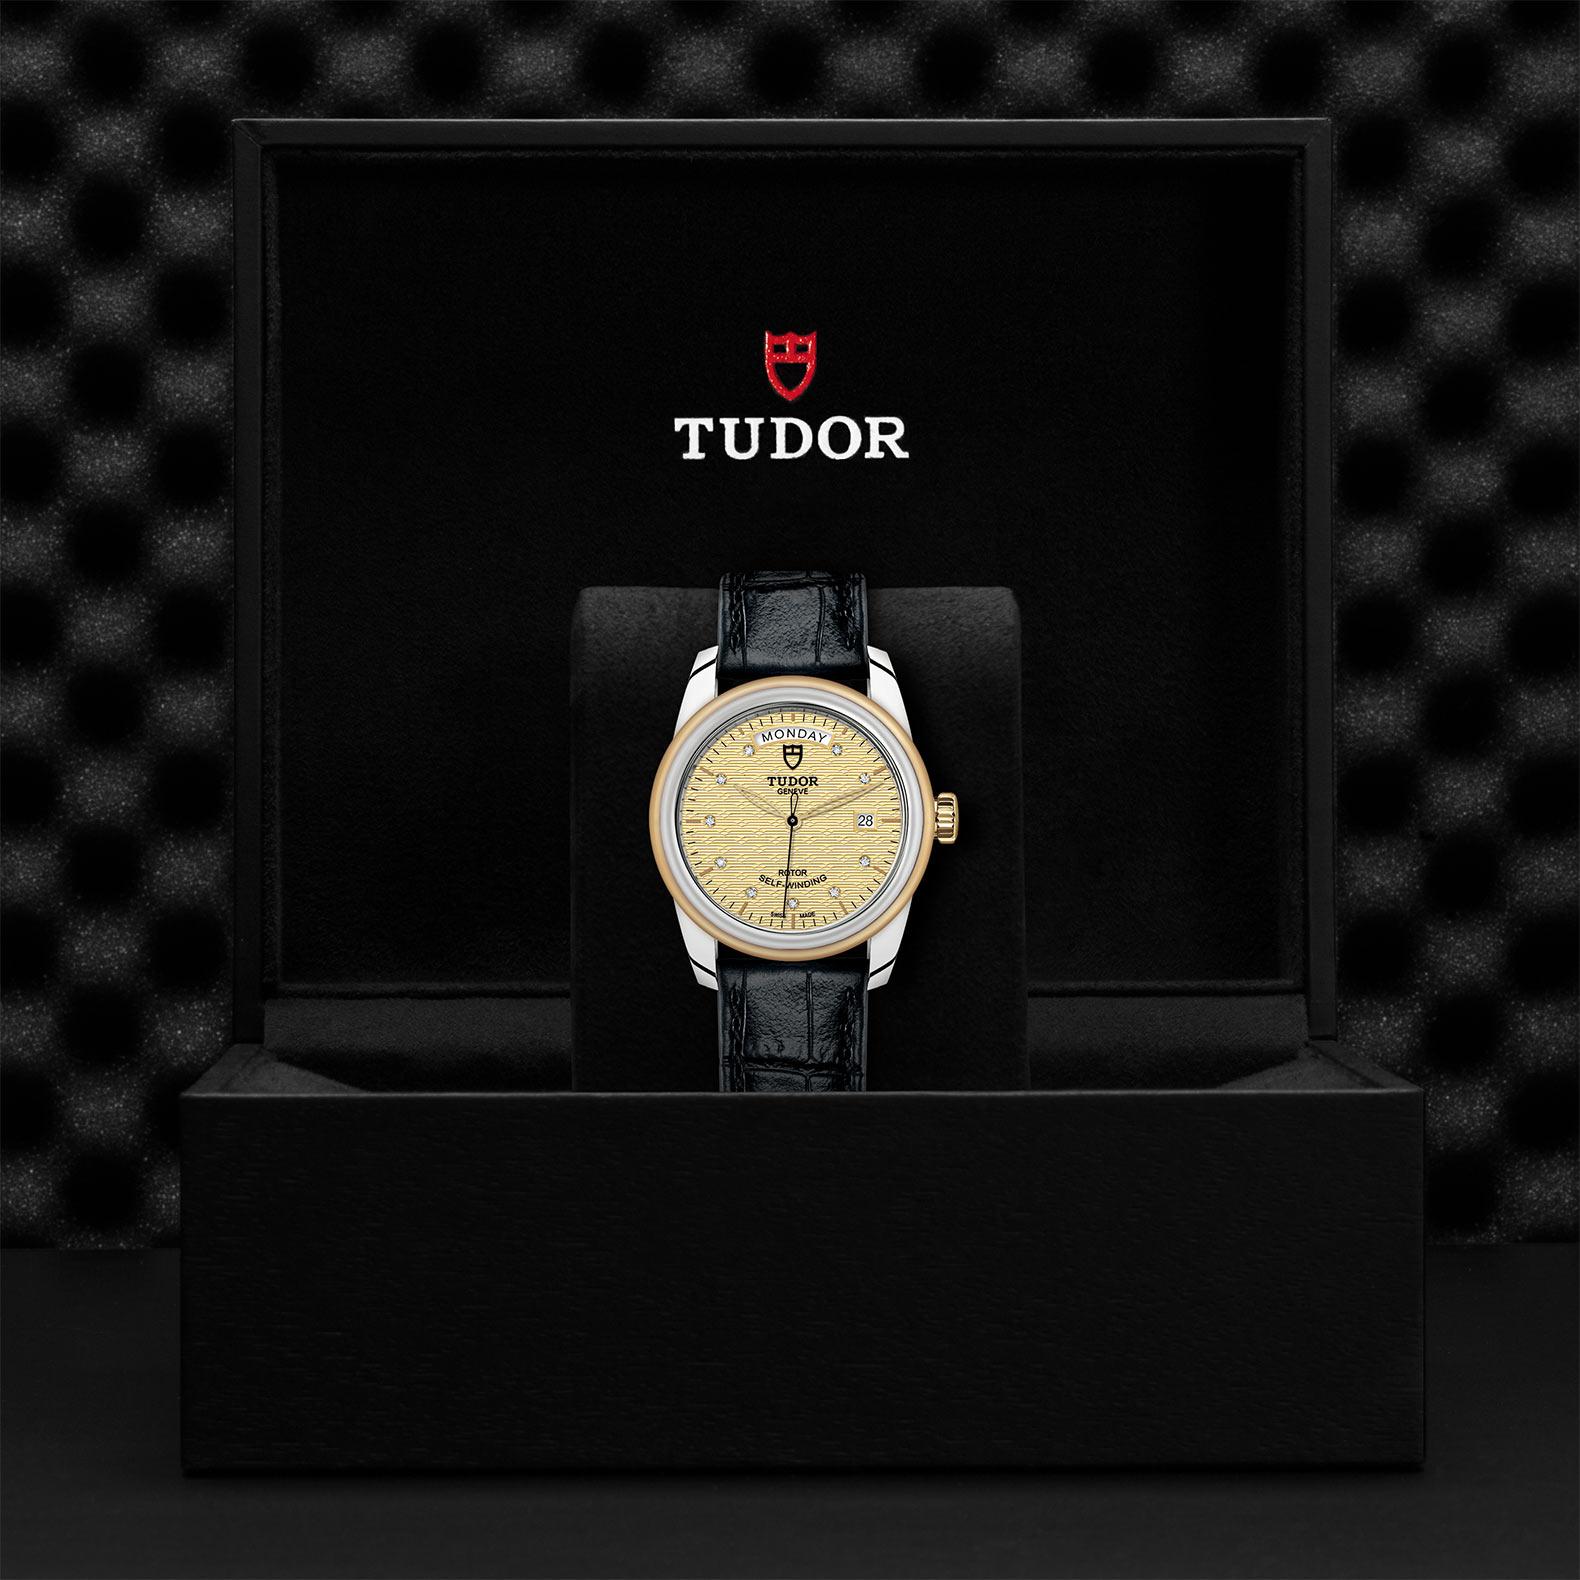 TUDOR Glamour Date Day M56003 0029 Presentation